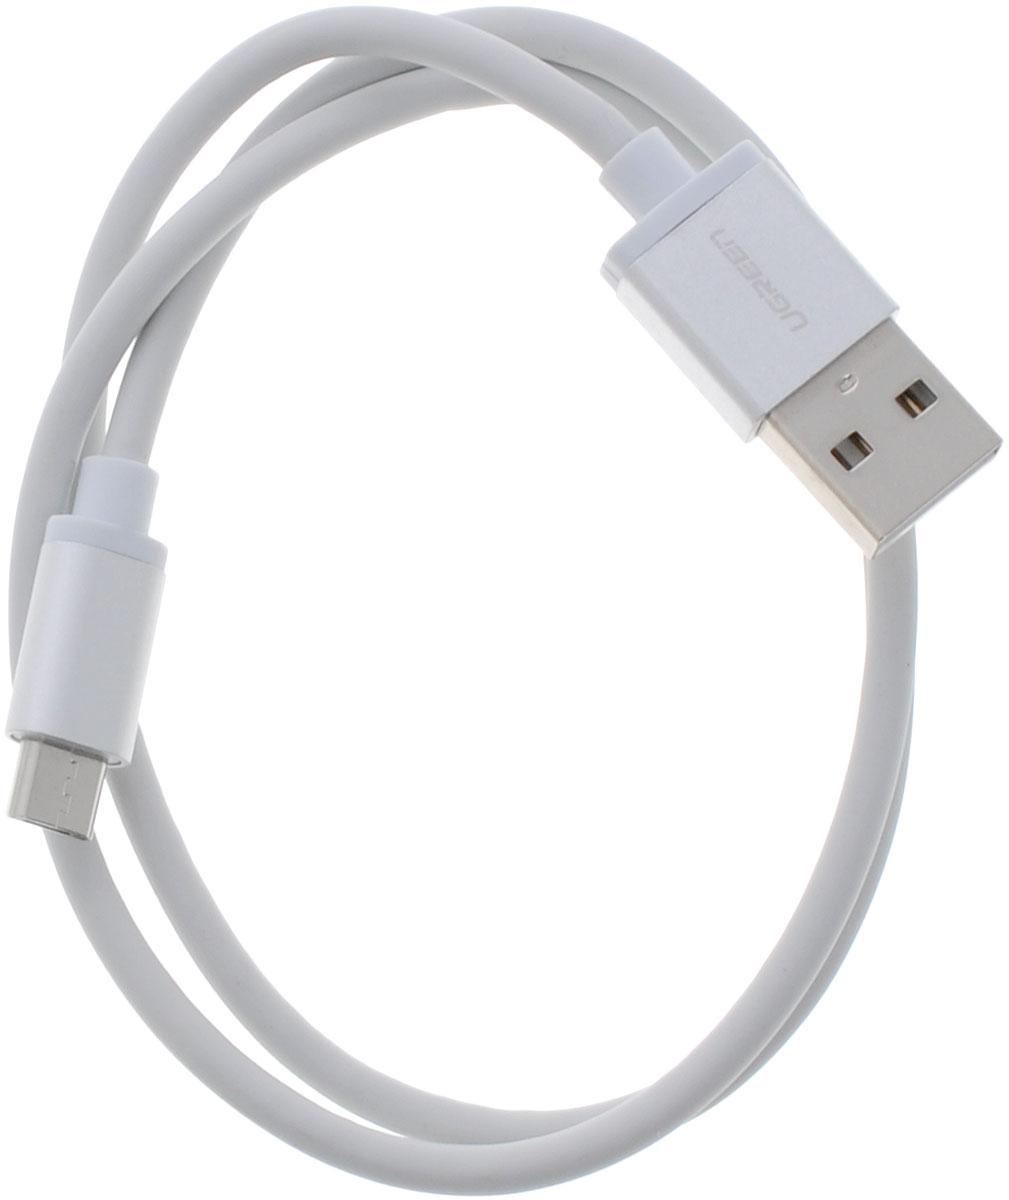 Ugreen UG-10828, White Silver кабель microUSB-USB 0.5 м